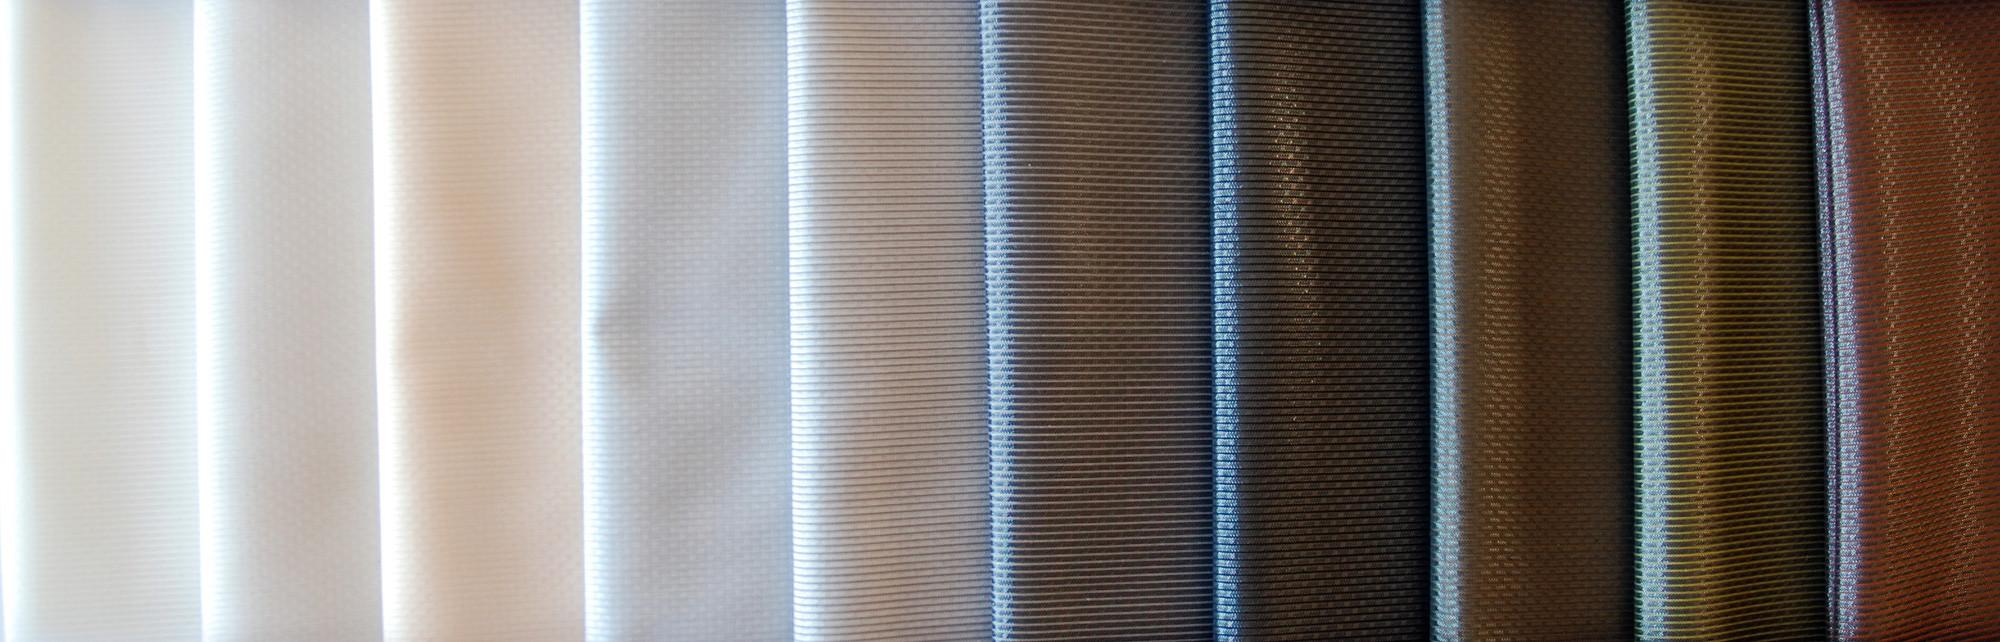 Schallabsorbierender Akustikstoff transparente akustikstoffe akustik produkte baunetz wissen